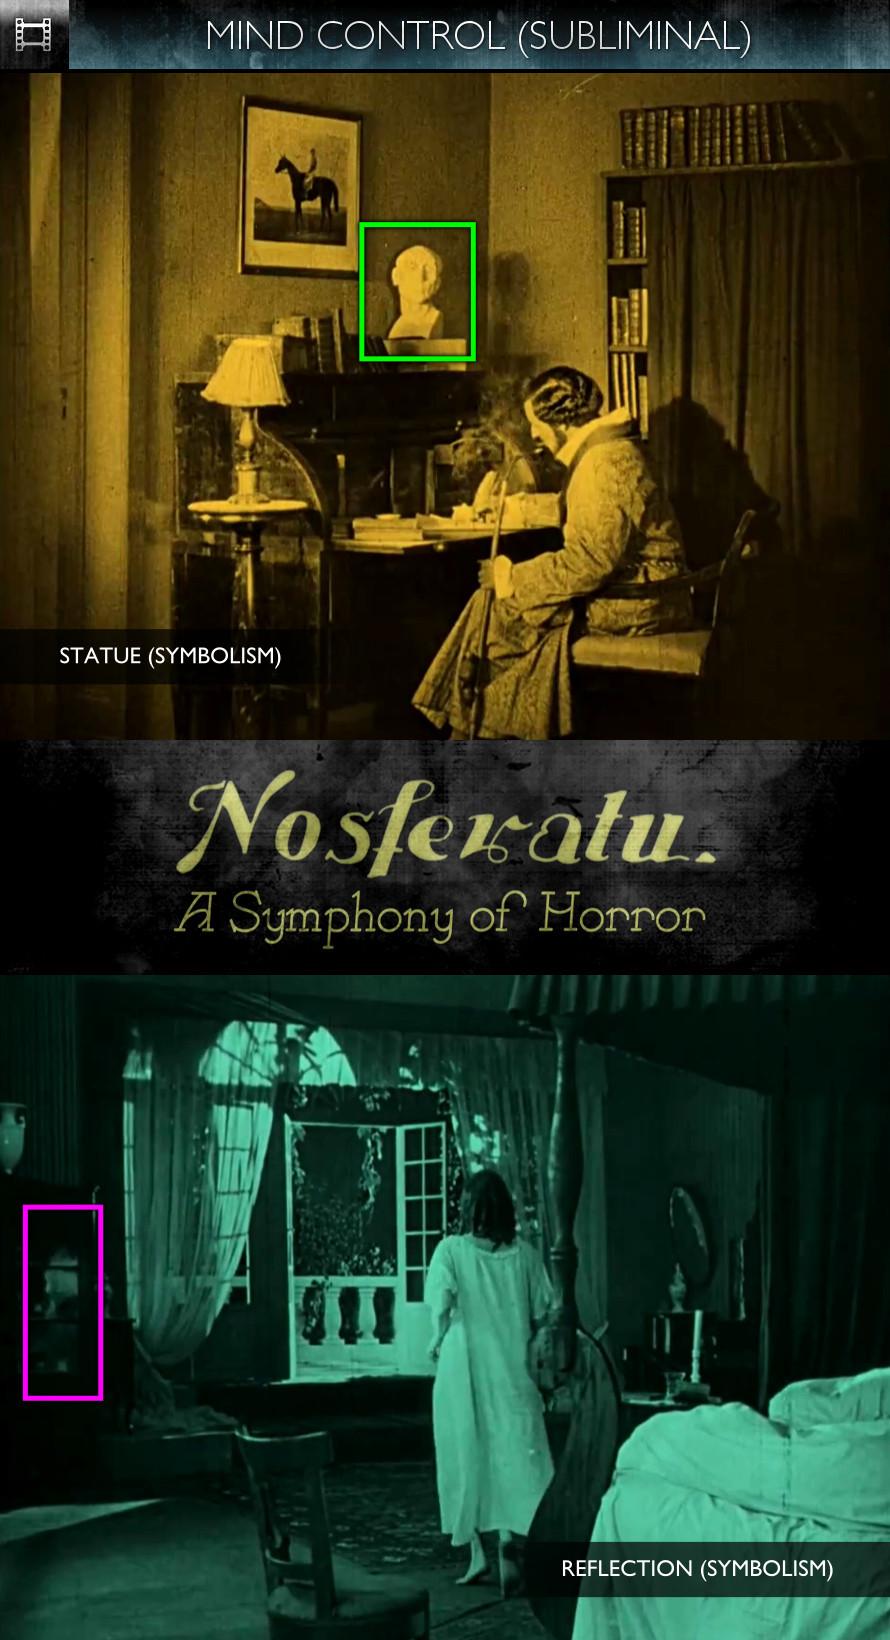 Nosferatu - A Symphony of Horror (1922) - Mind Control - Subliminal